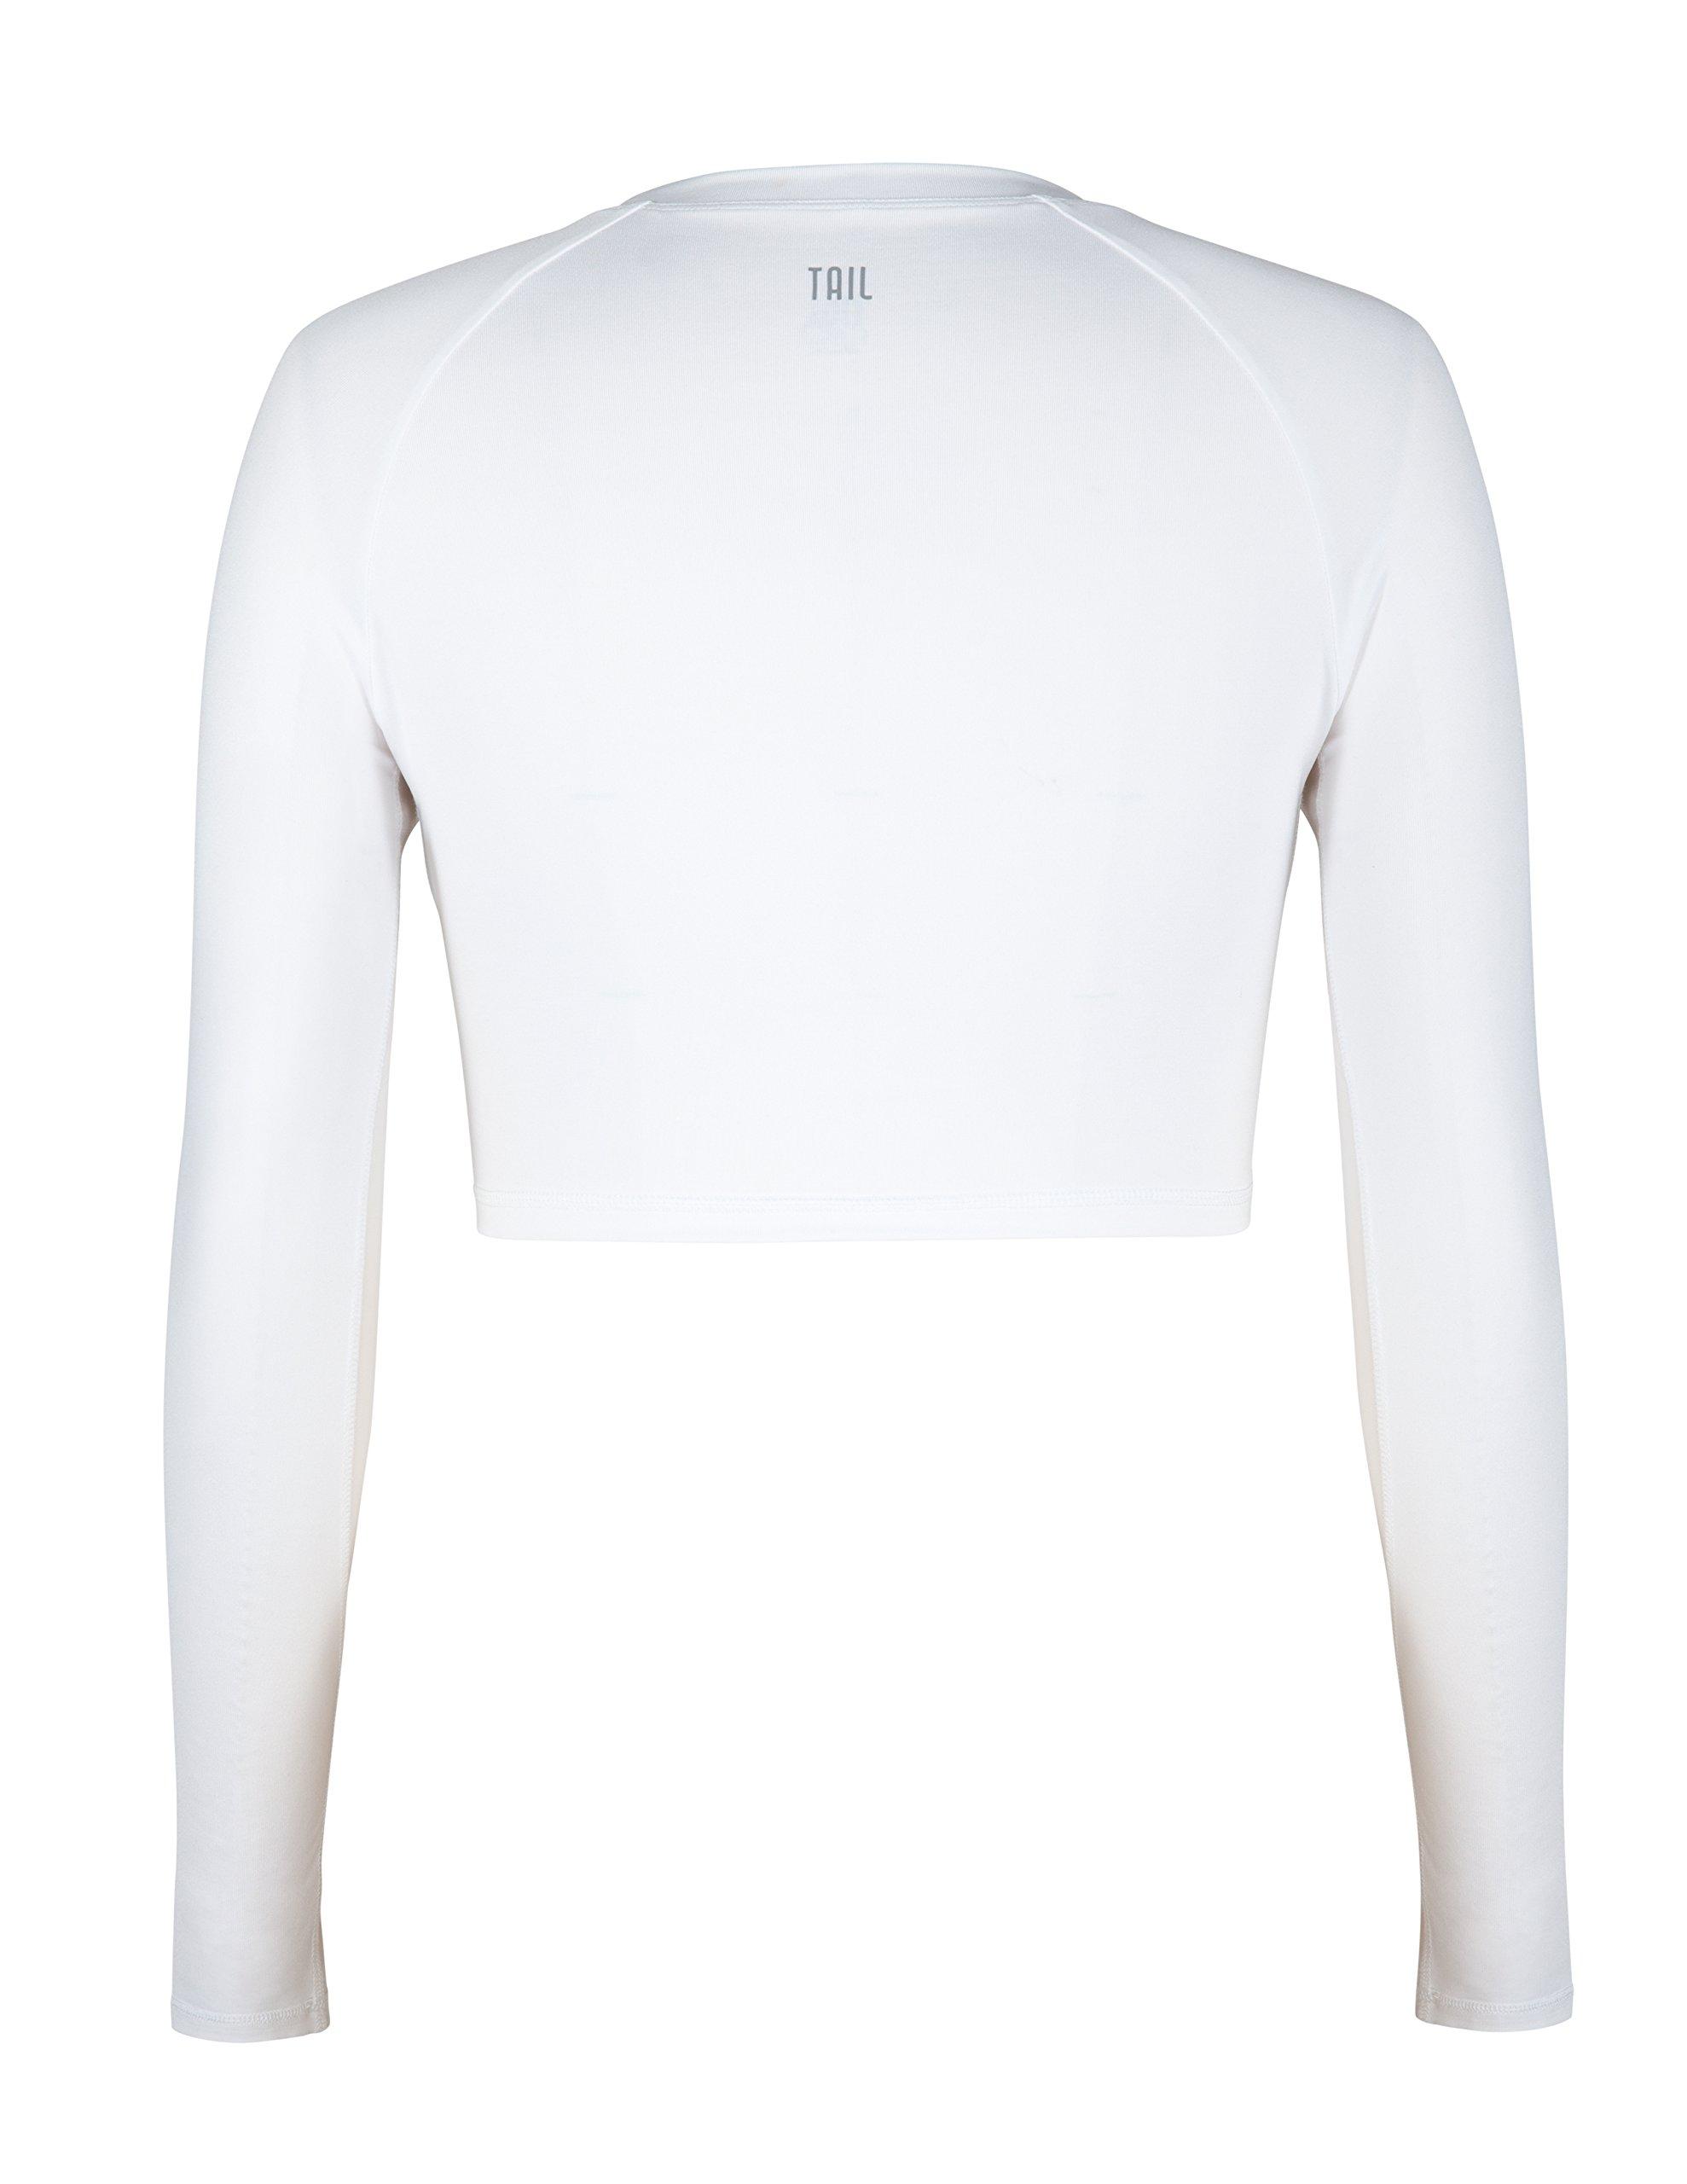 Tail Activewear Women's Sasha Crop Top Large White by Tail (Image #4)